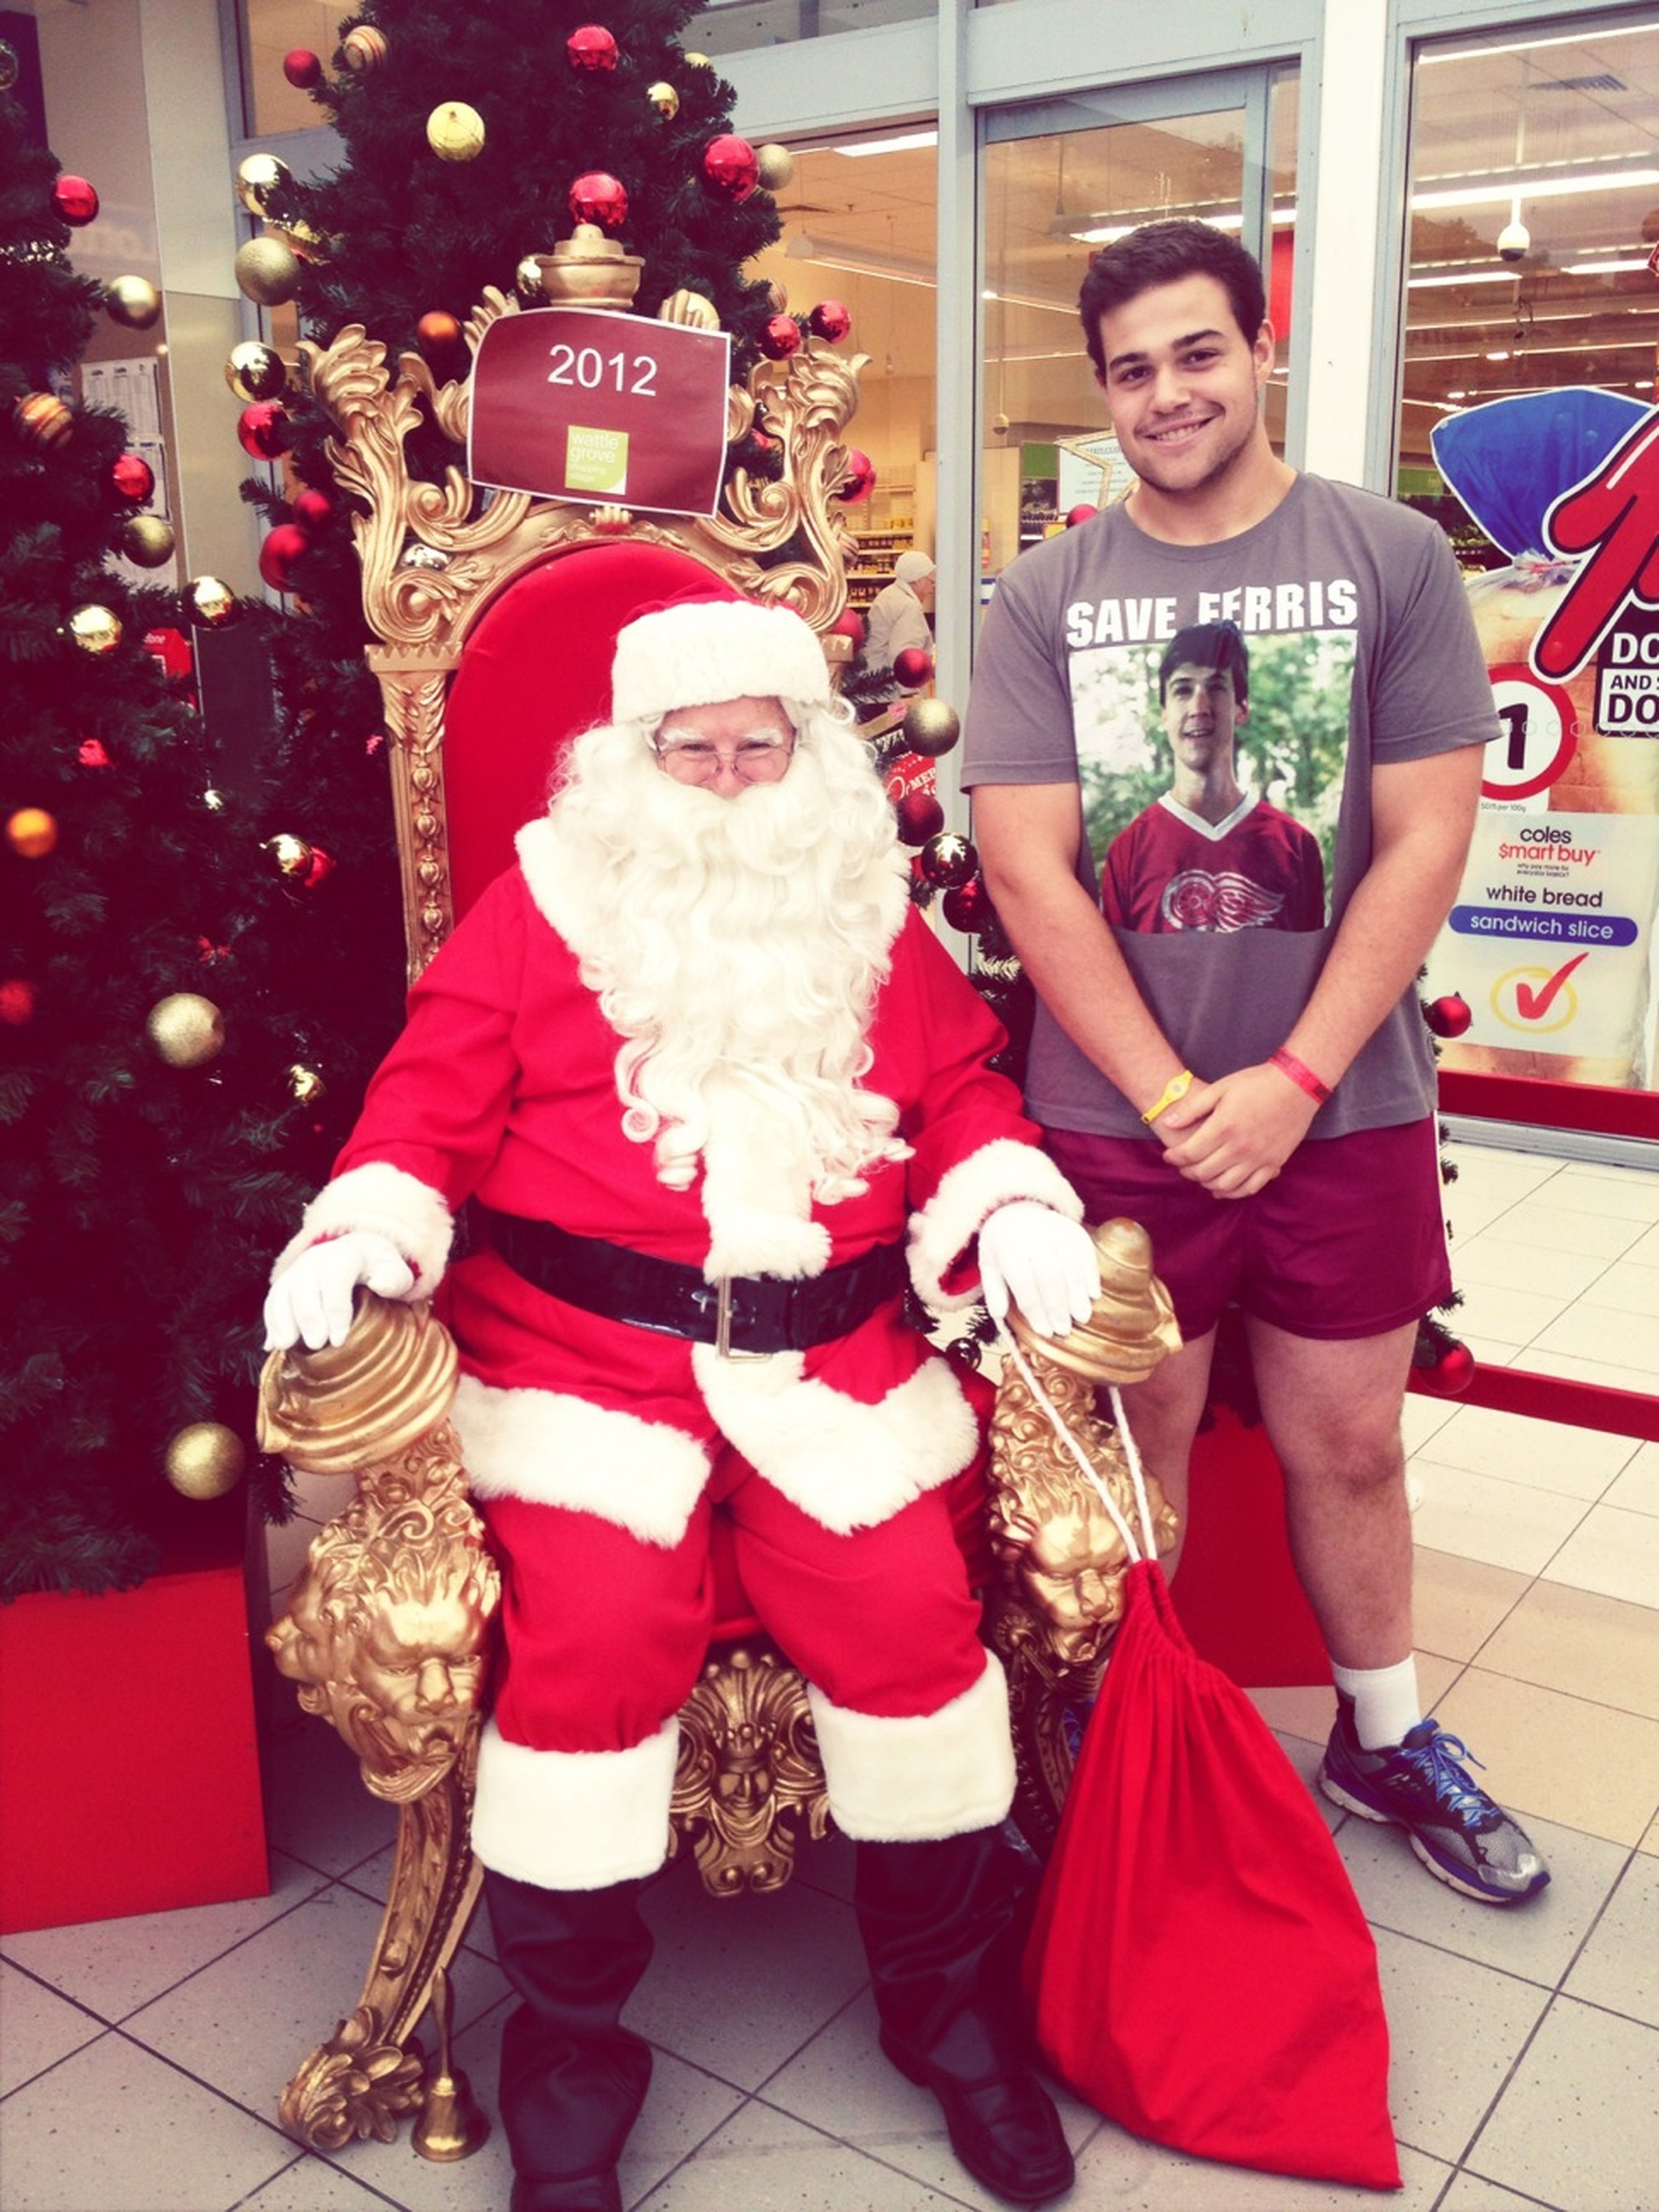 Yo Santa, Wassuuu!?